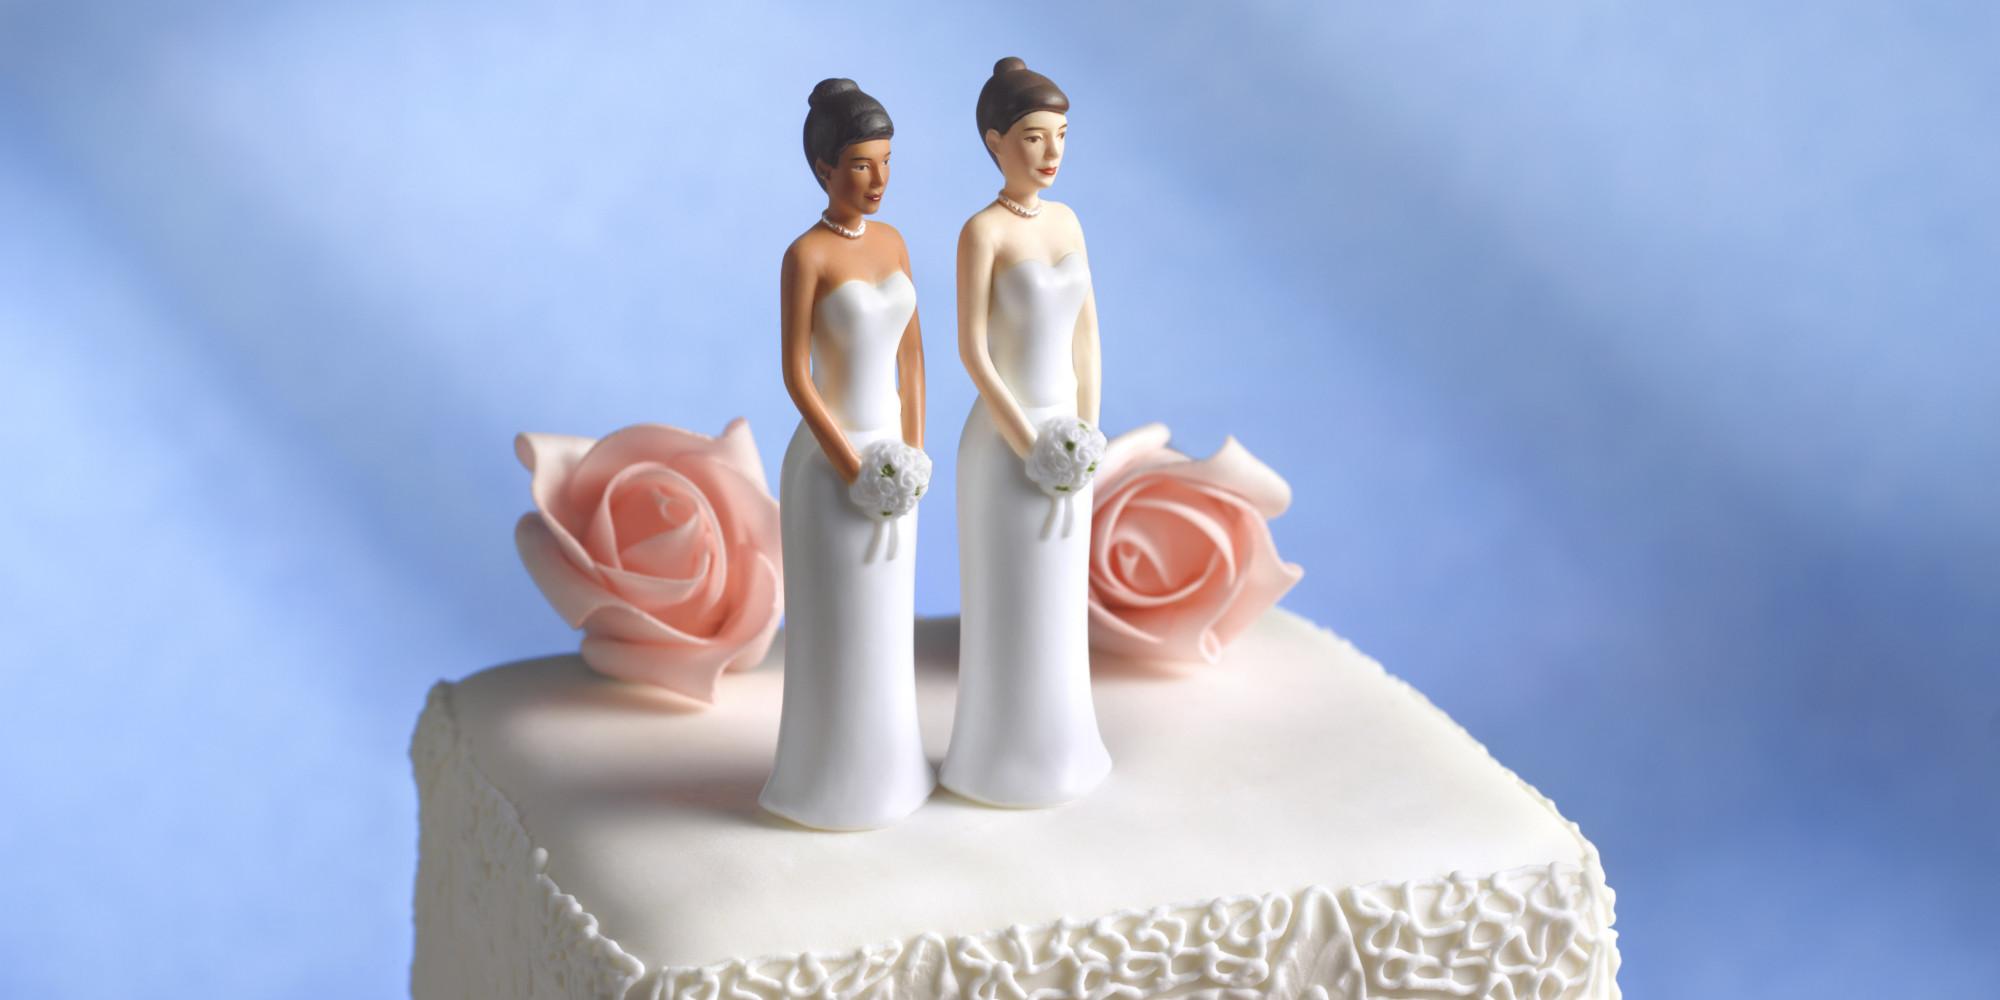 iowa wedding cake lesbian couple n .